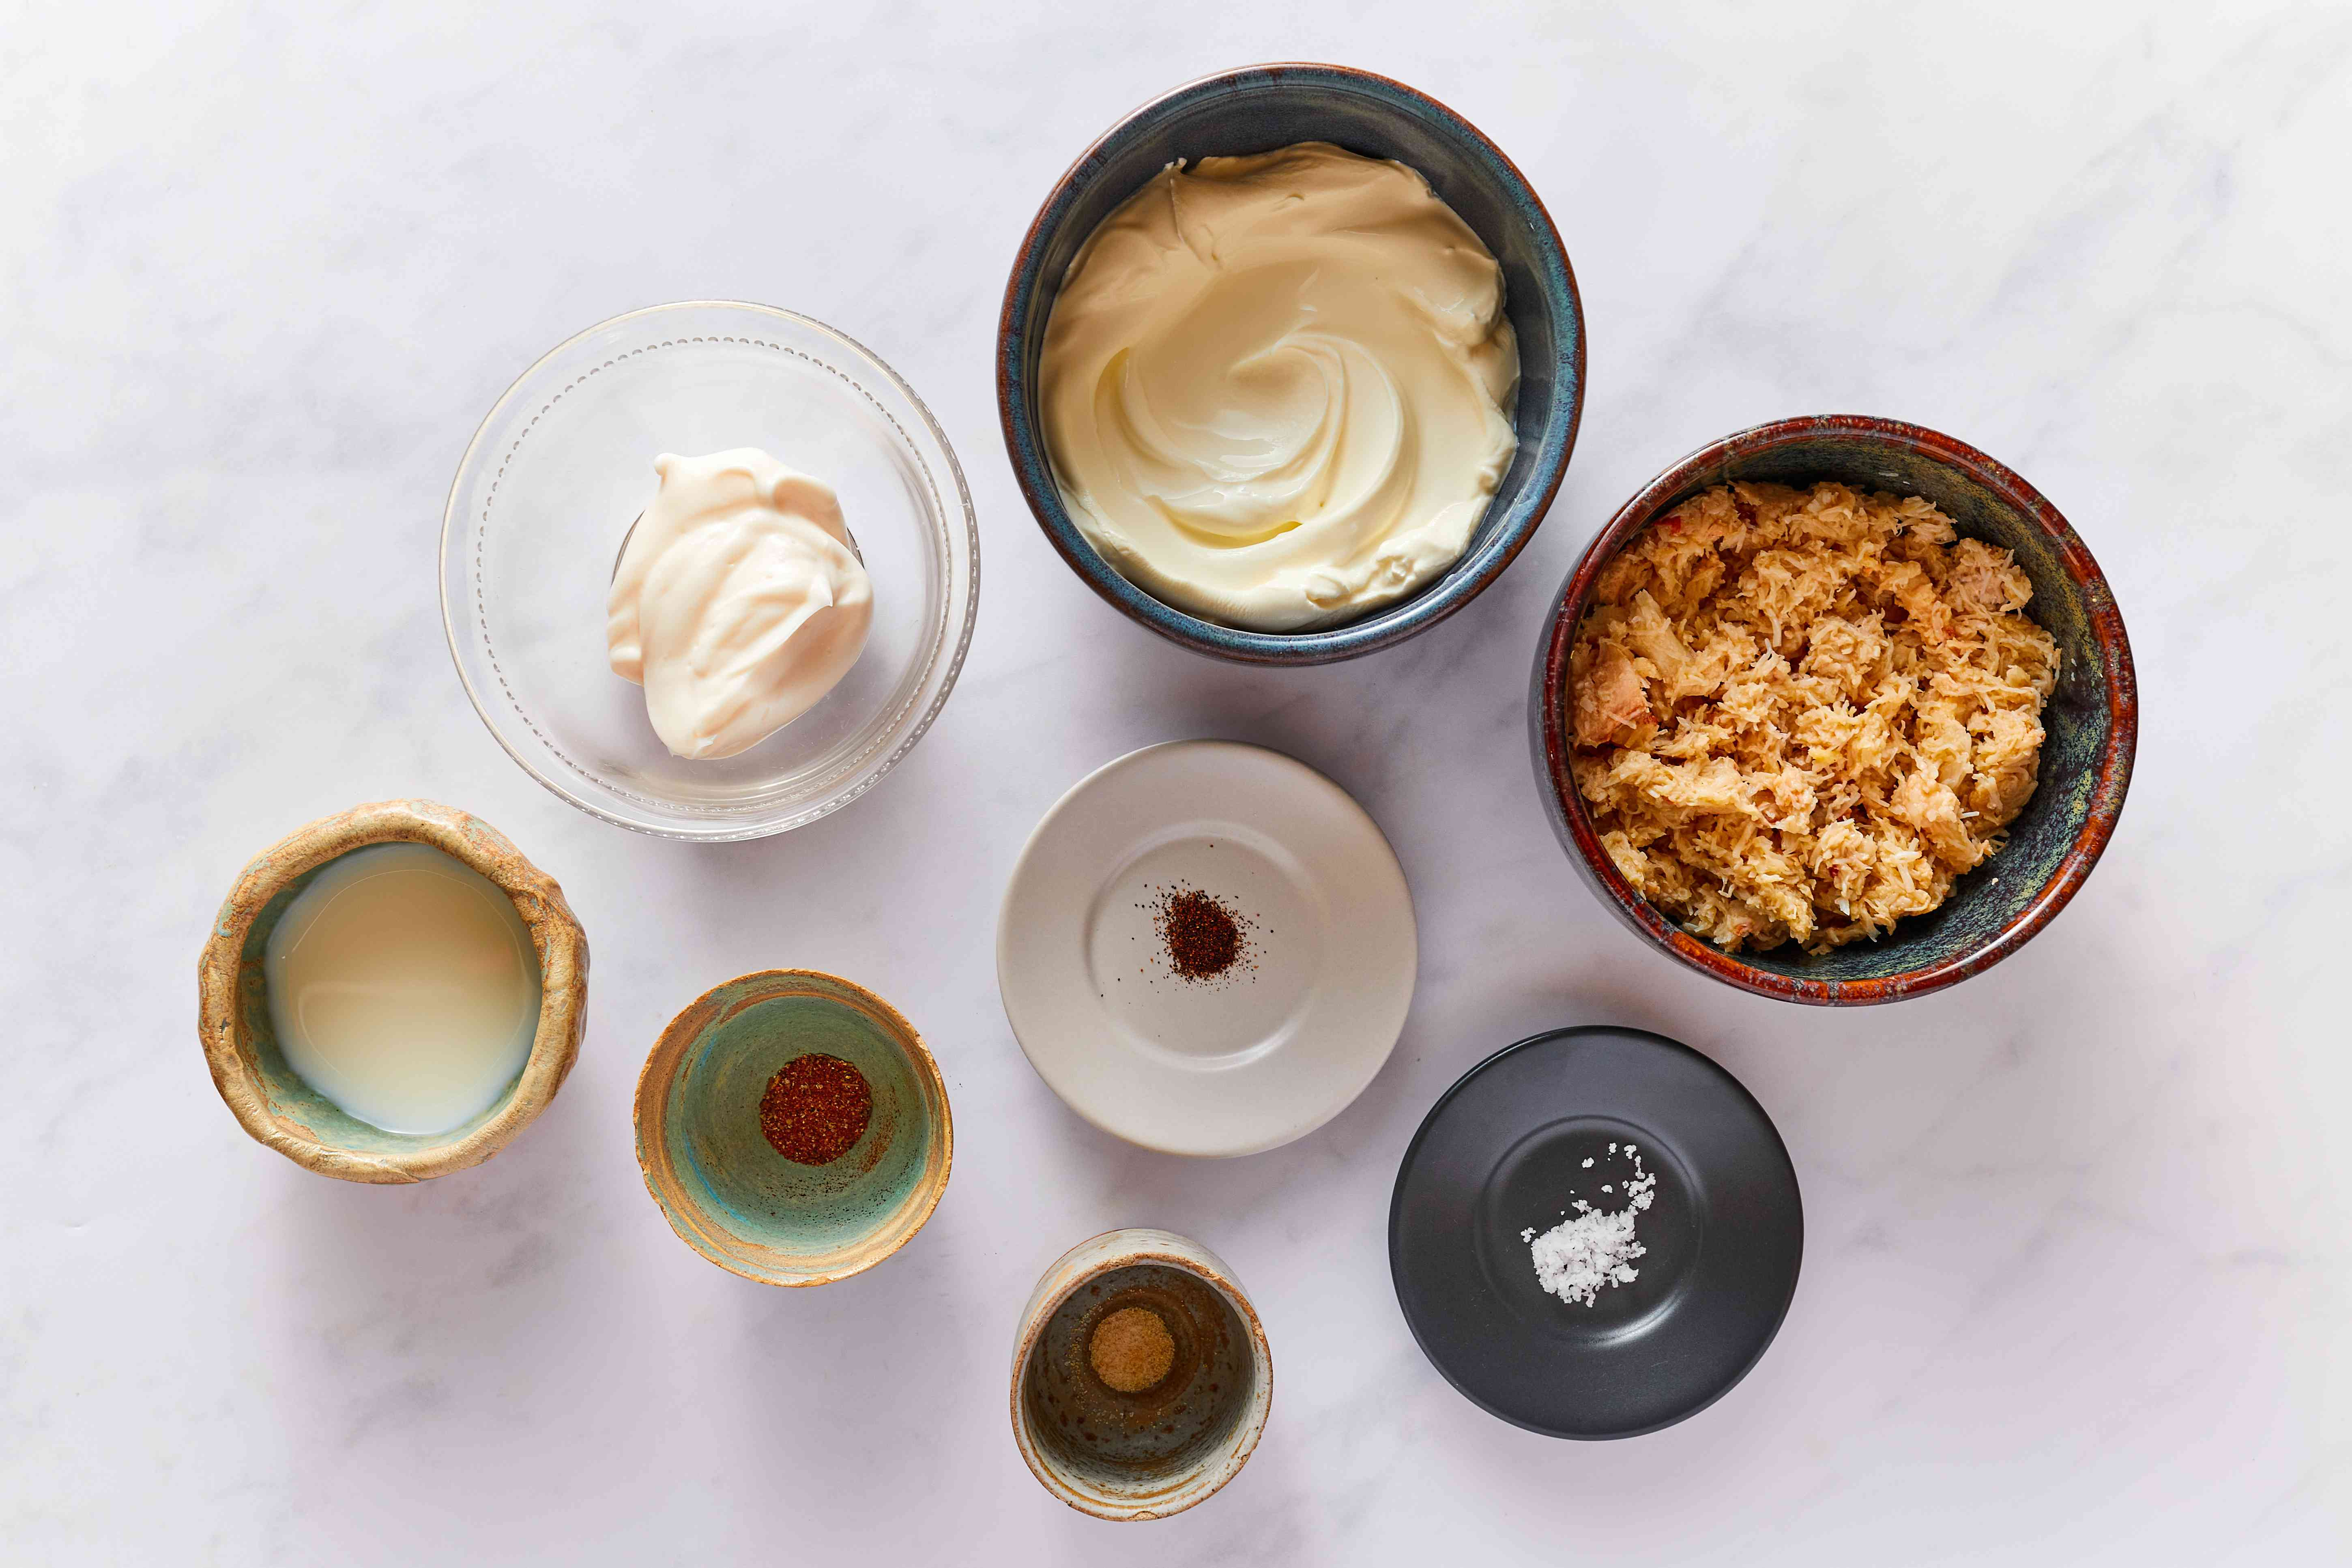 Creamy crab dip recipe ingredients